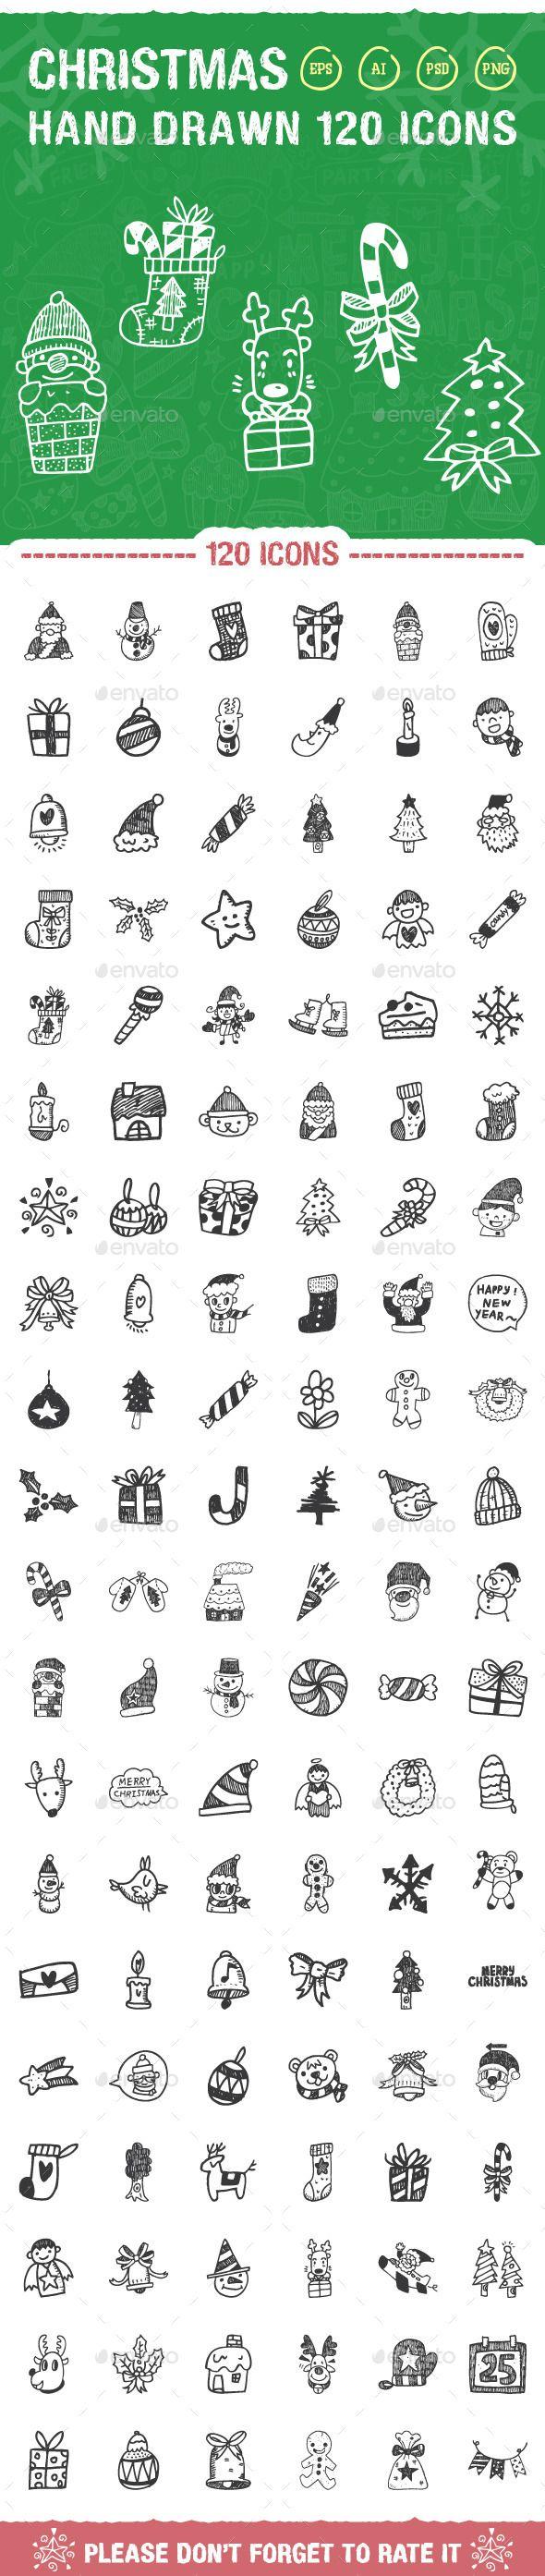 120 Hand Drawn Christmas Icons - Seasonal Icons